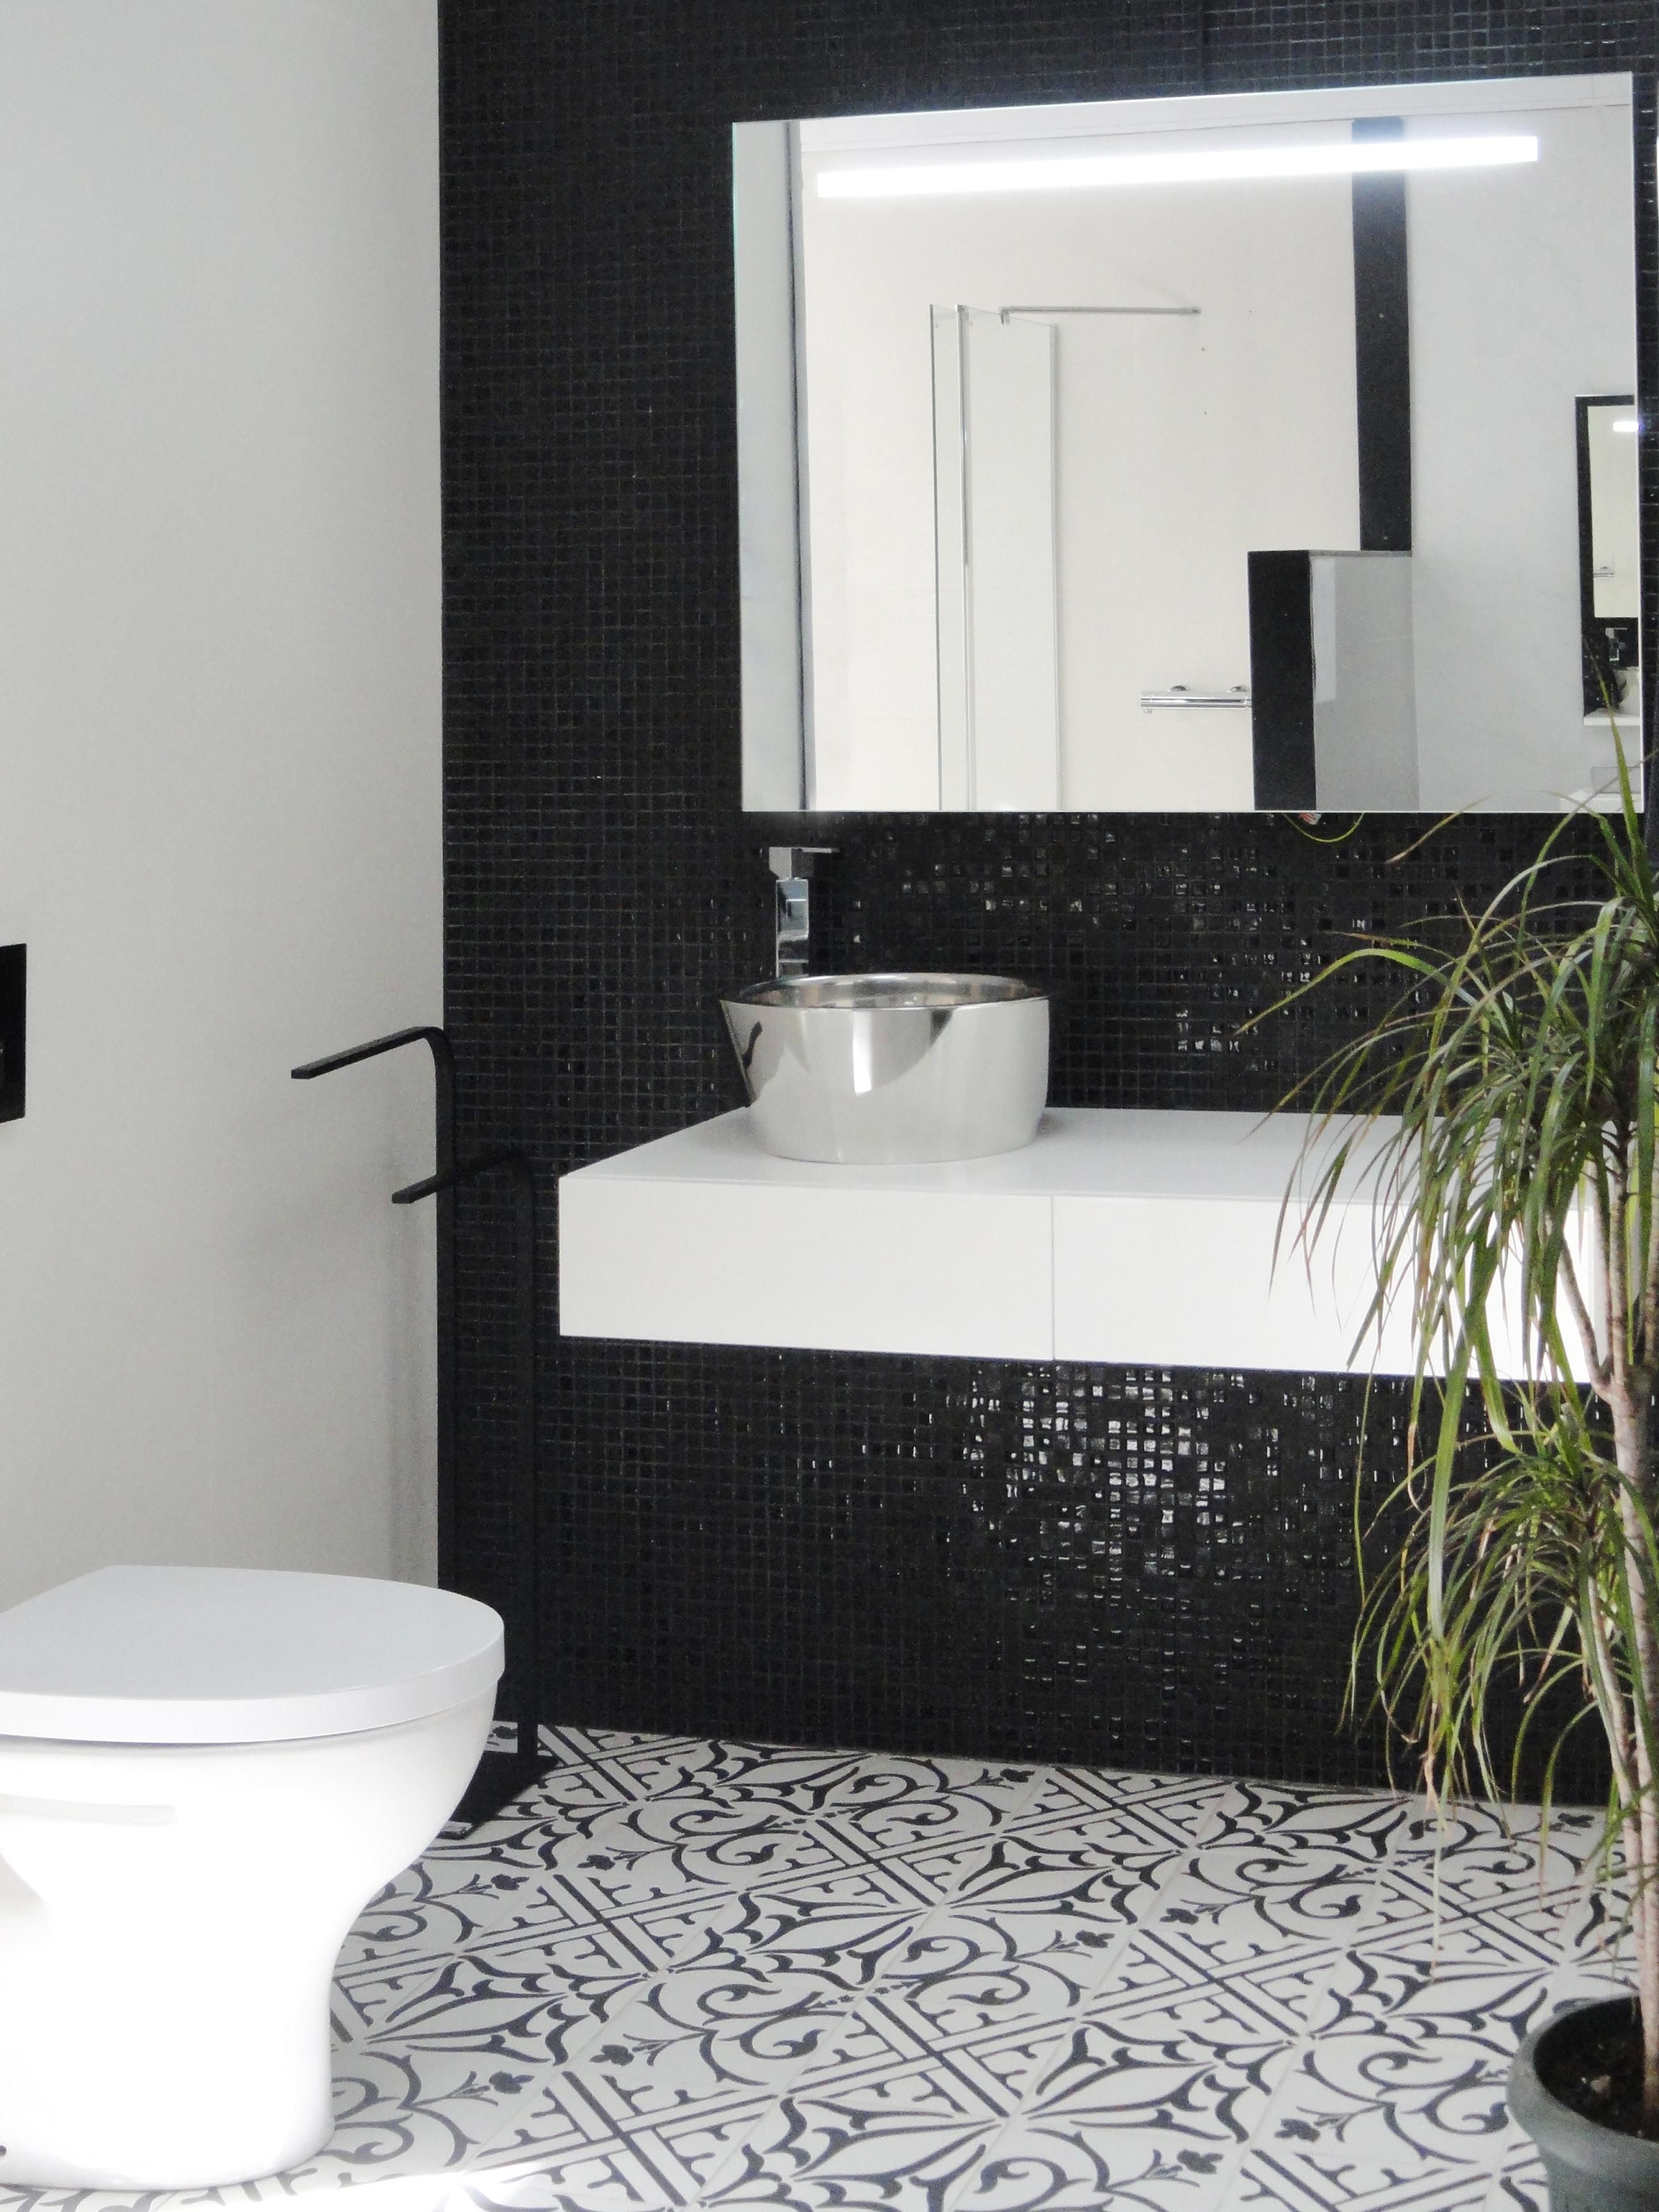 Badezimmer dekor grau décor classic noir  fusion  ceramic tiles from neocim and